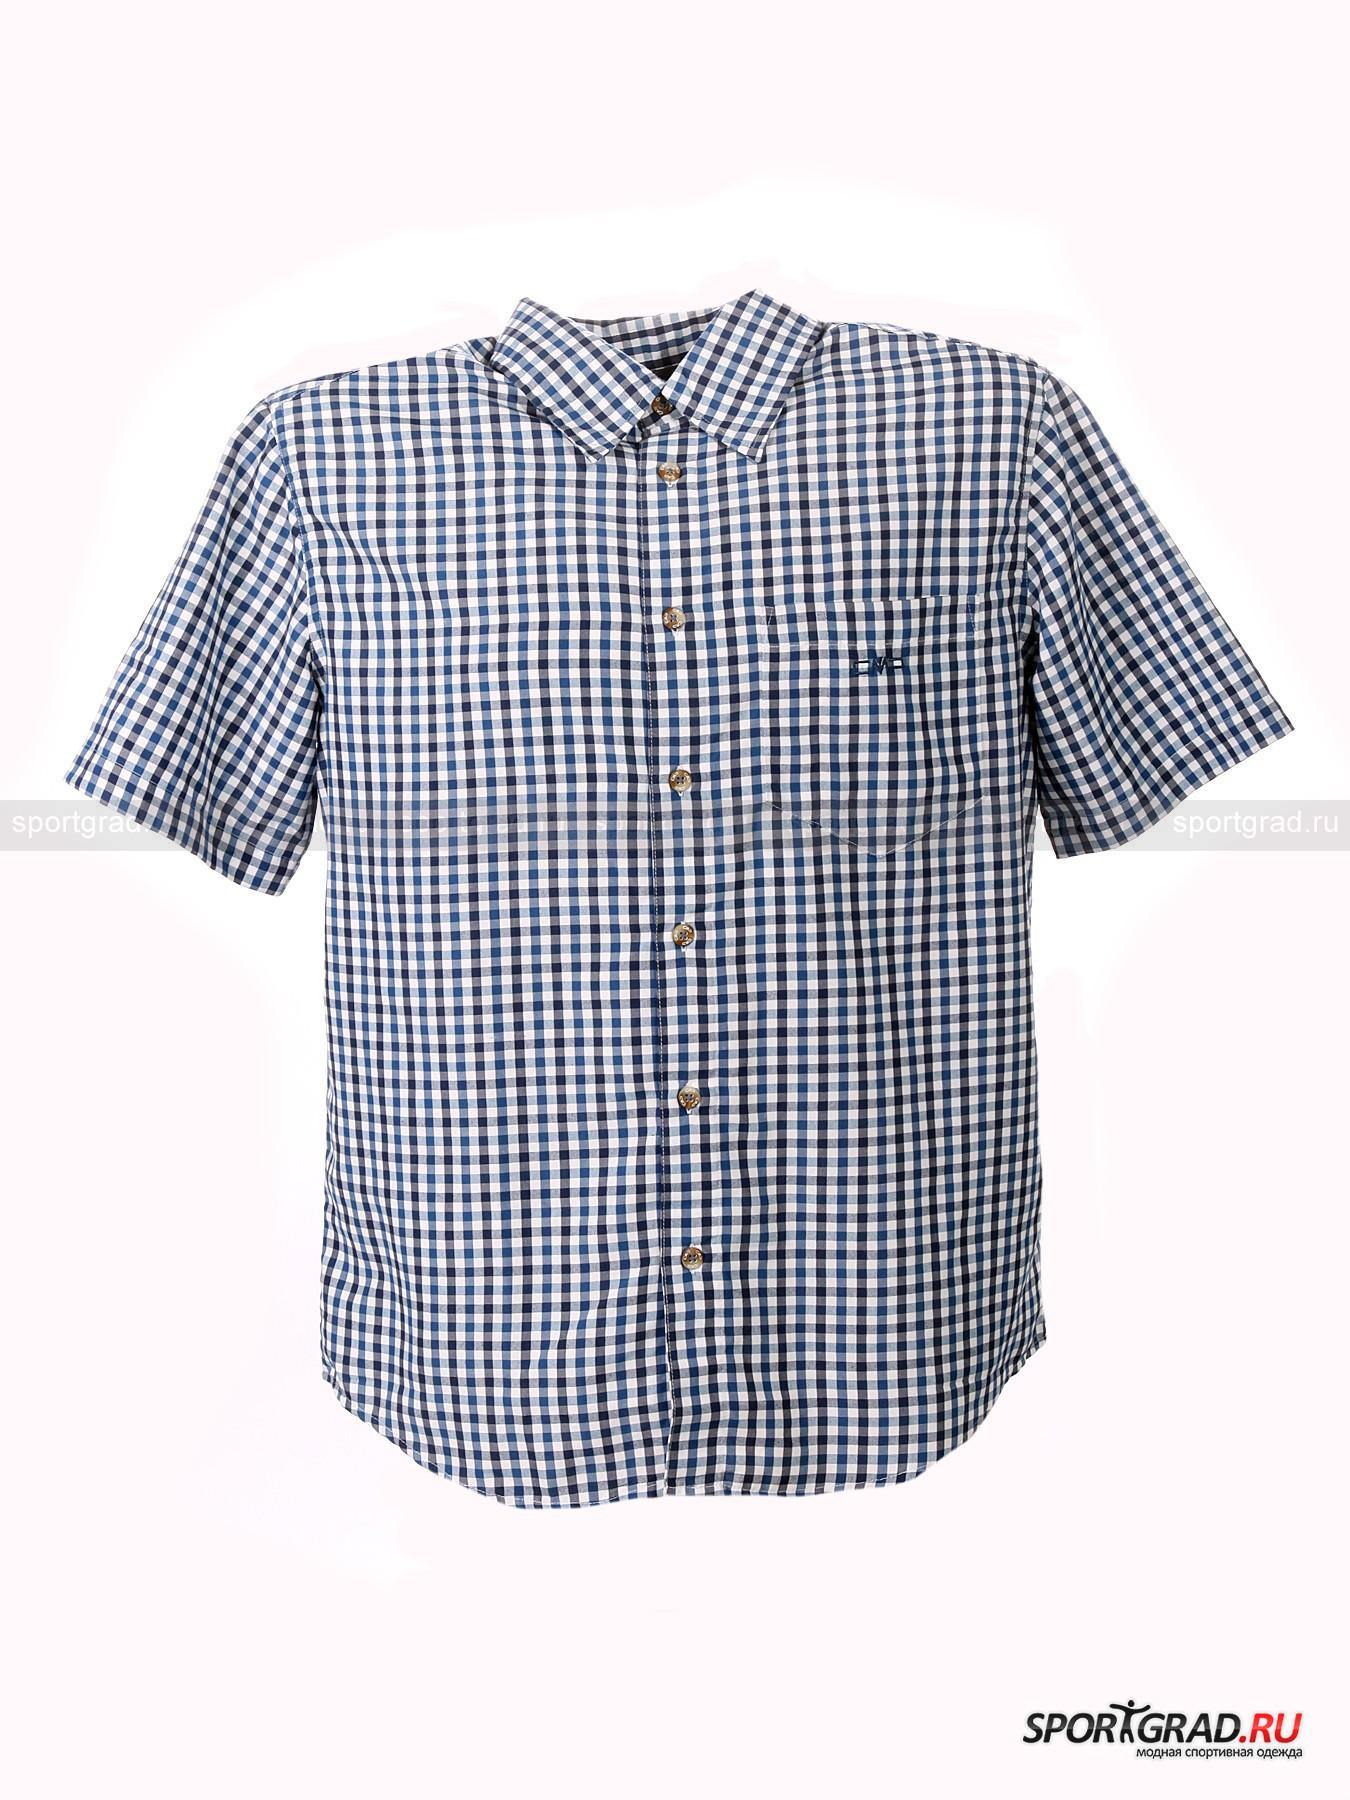 Рубашка мужская  MAN SHIRT CAMPAGNOLO от Спортград